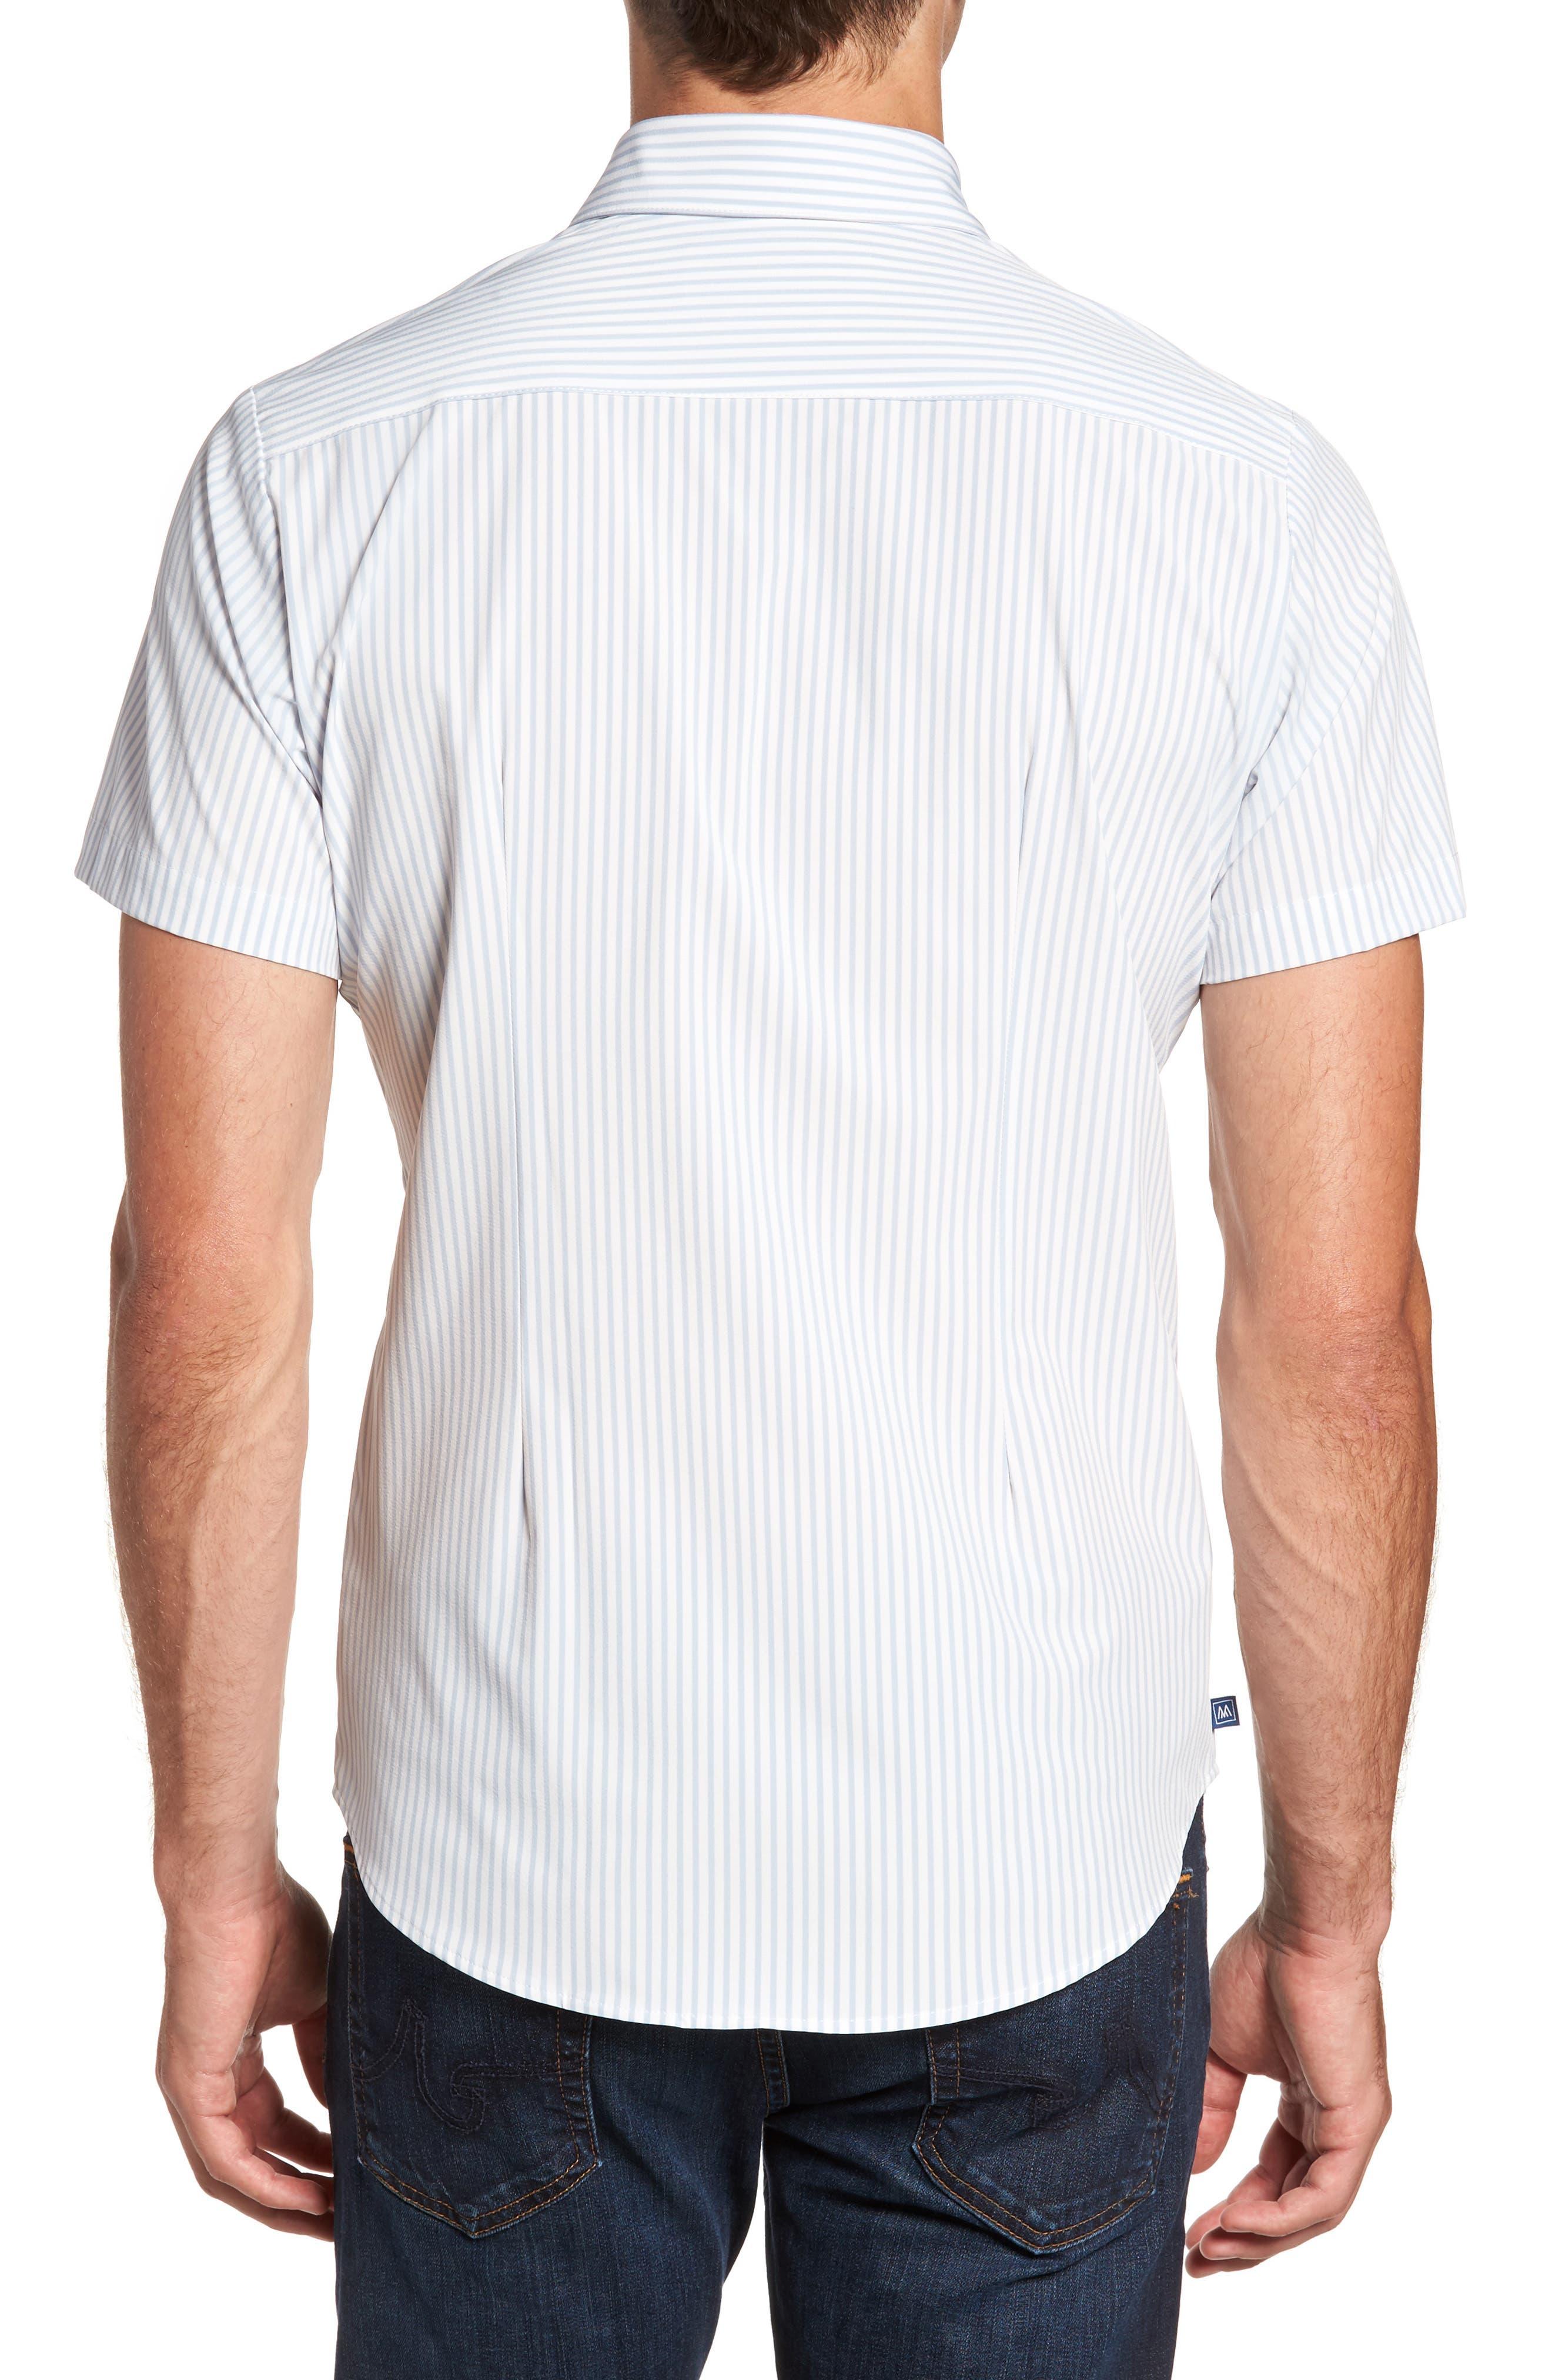 St. Elias Stripe Sport Shirt,                             Alternate thumbnail 2, color,                             100